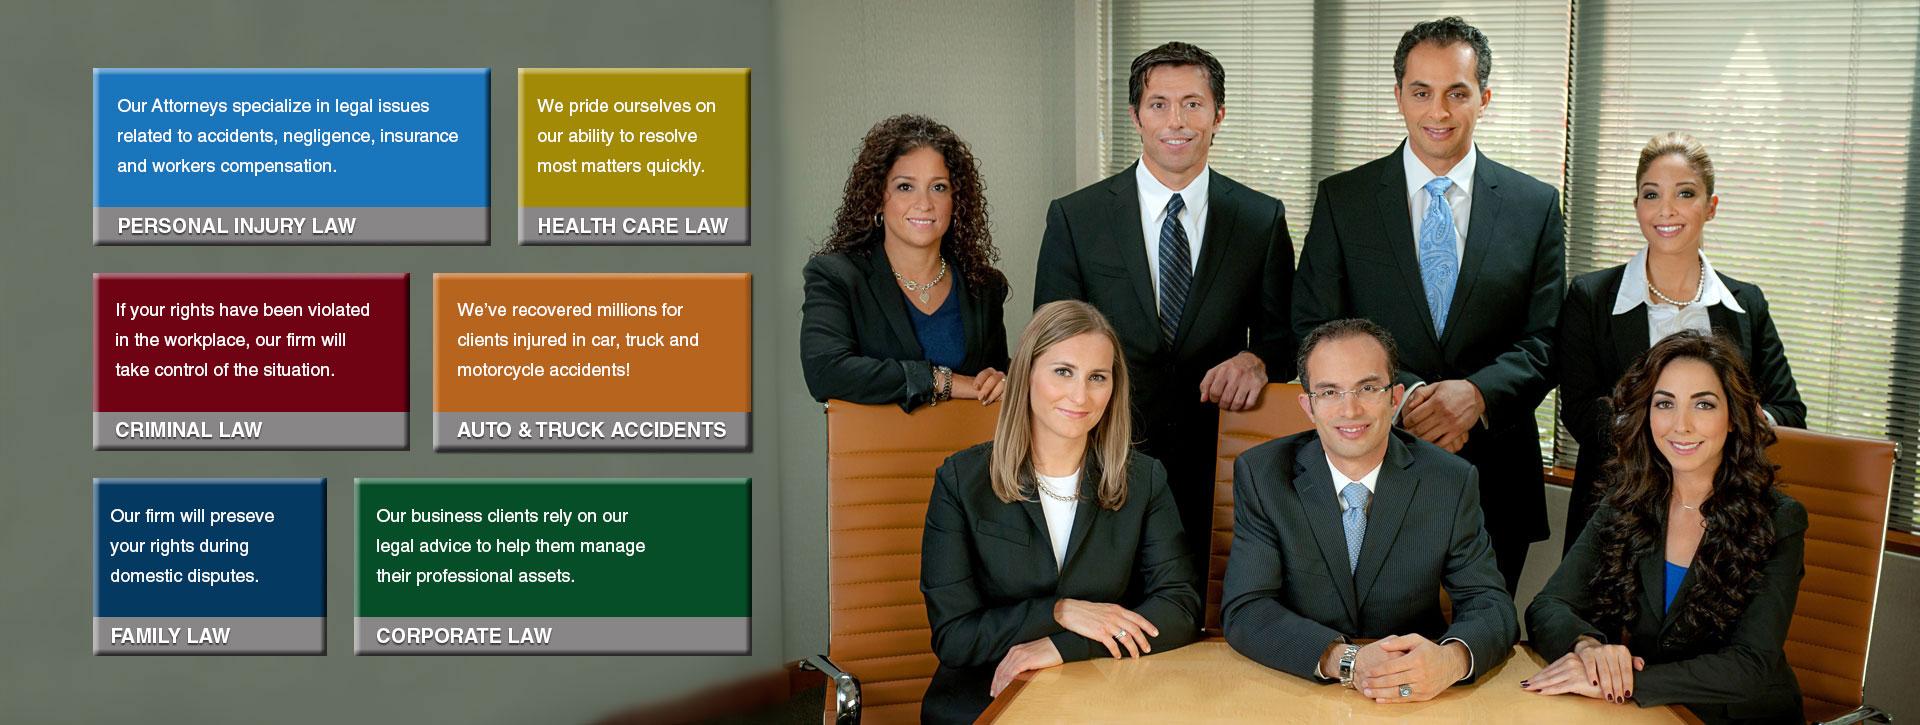 Dearborn Attorneys | Elder Brinkman Law | Attorneys in